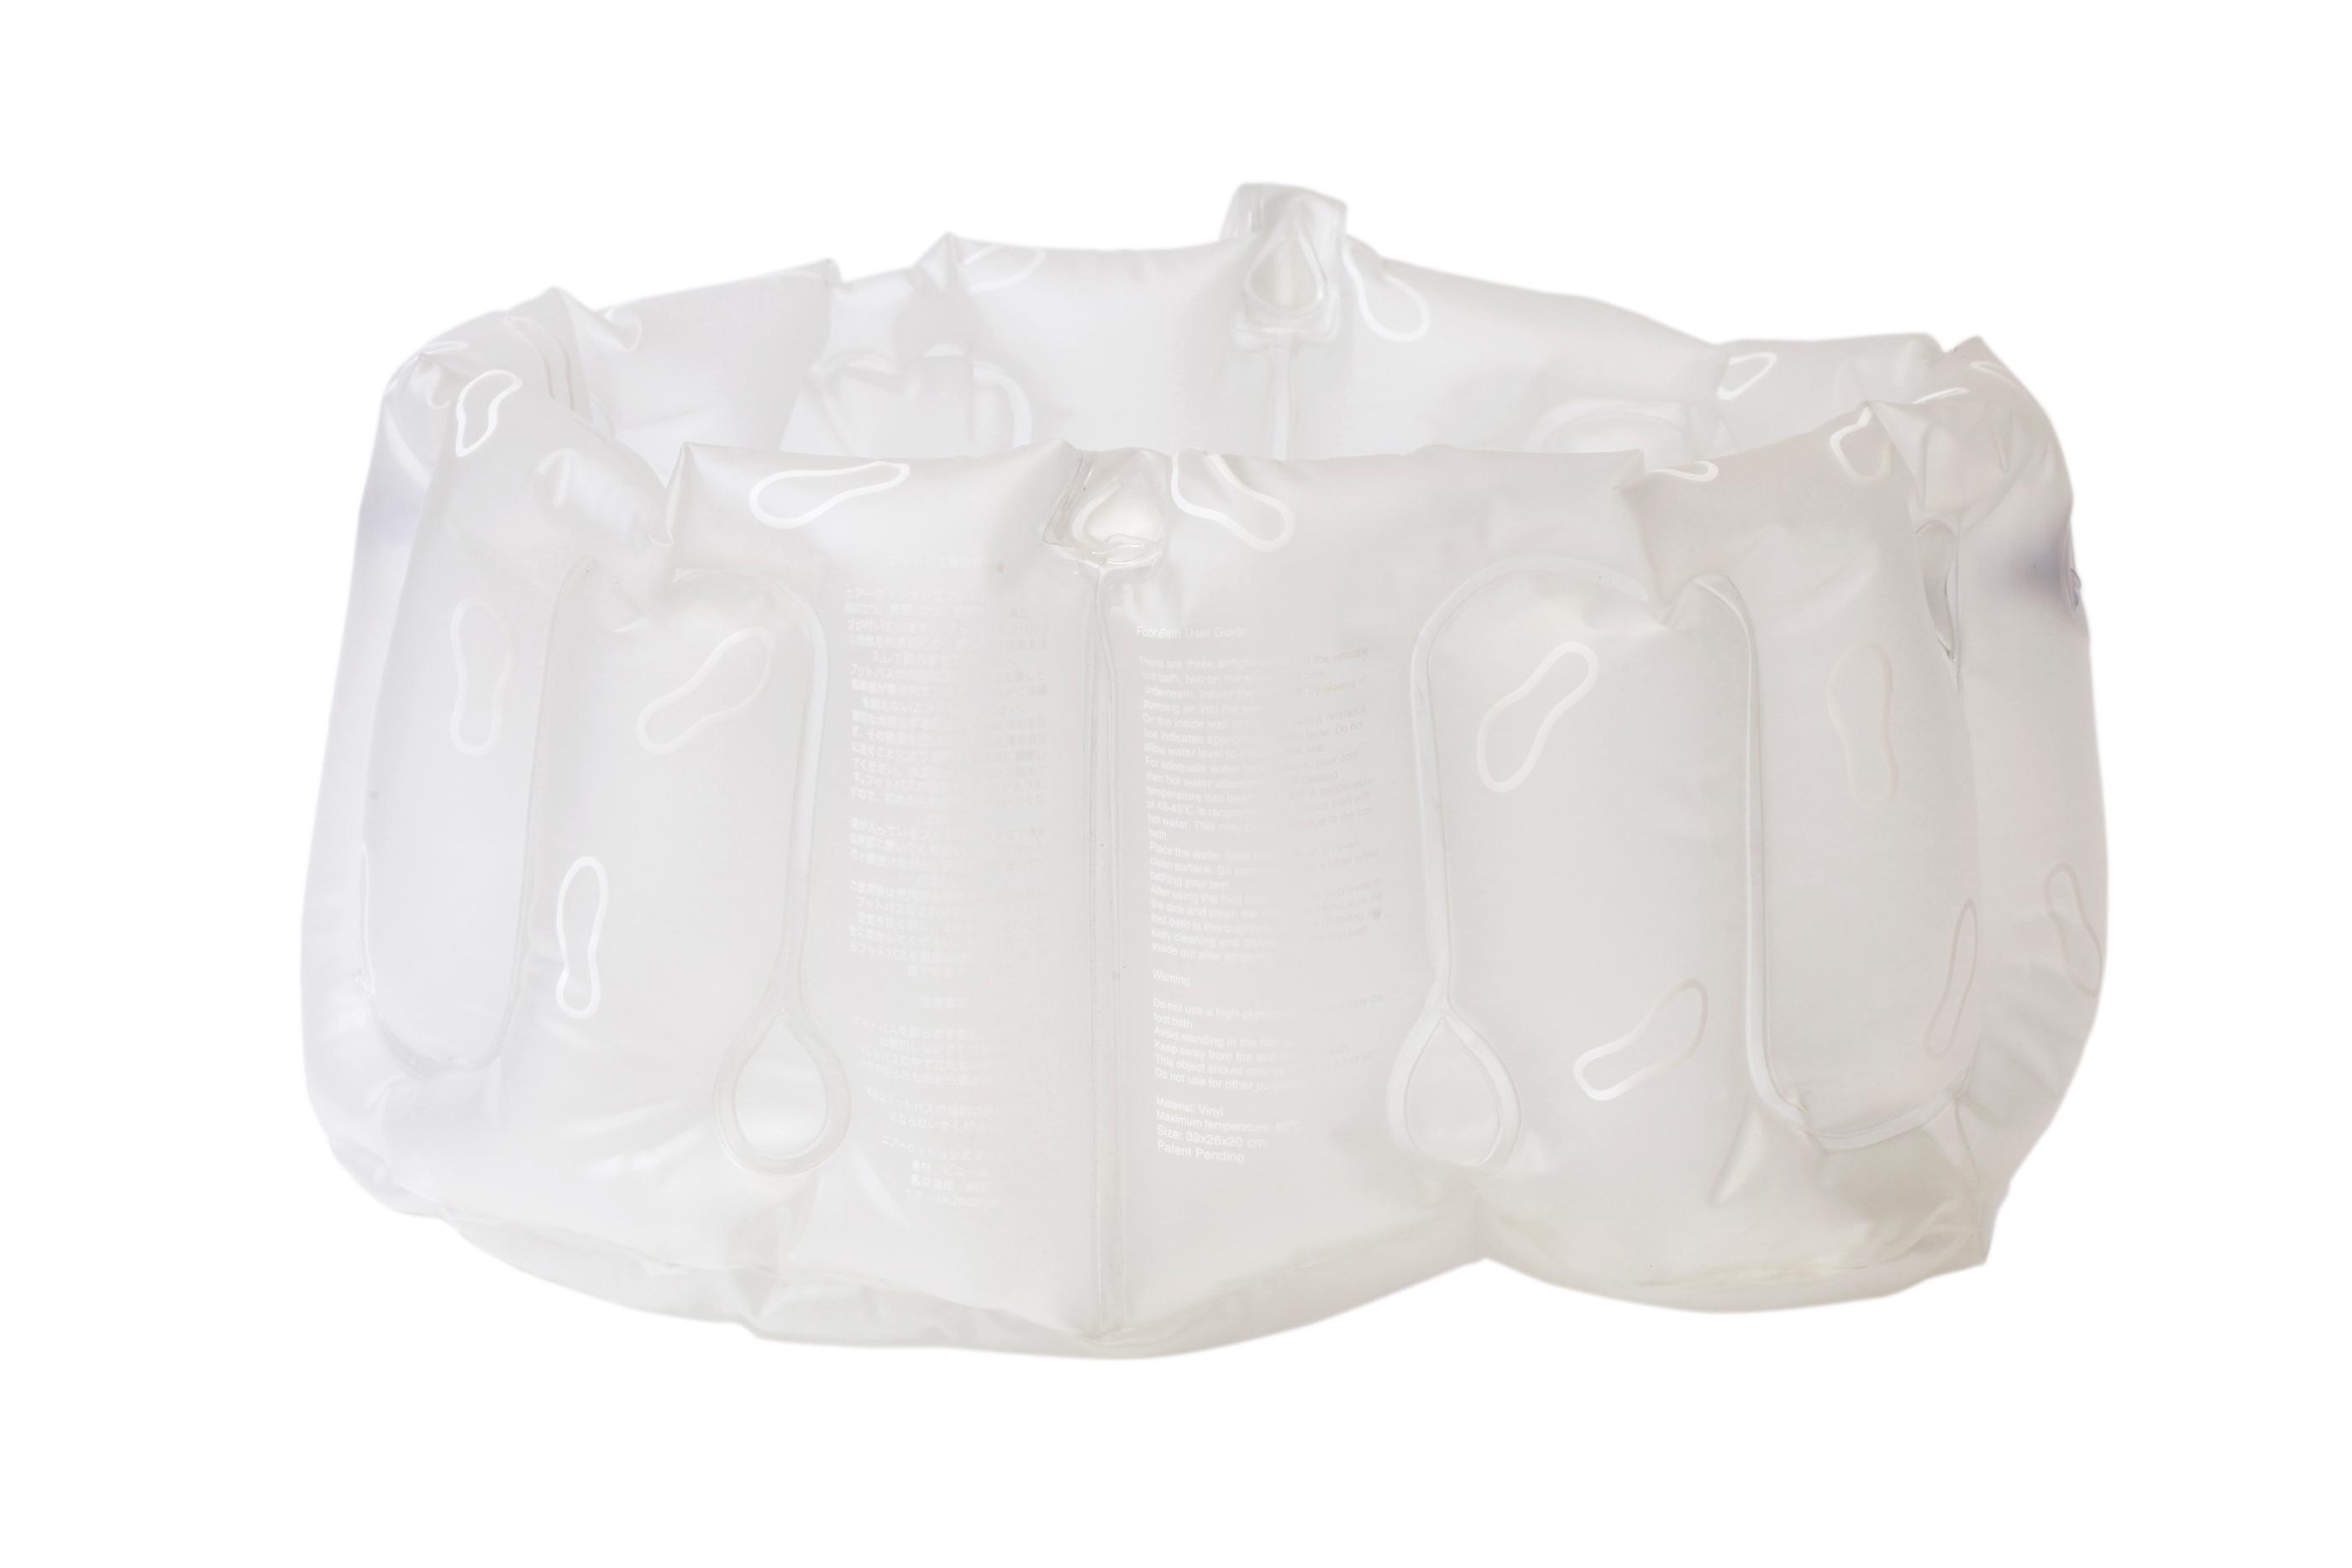 Uppblåsbart Fotbad Med Handtag Frostvitåtervunnen Plast (vinyl) Bosign